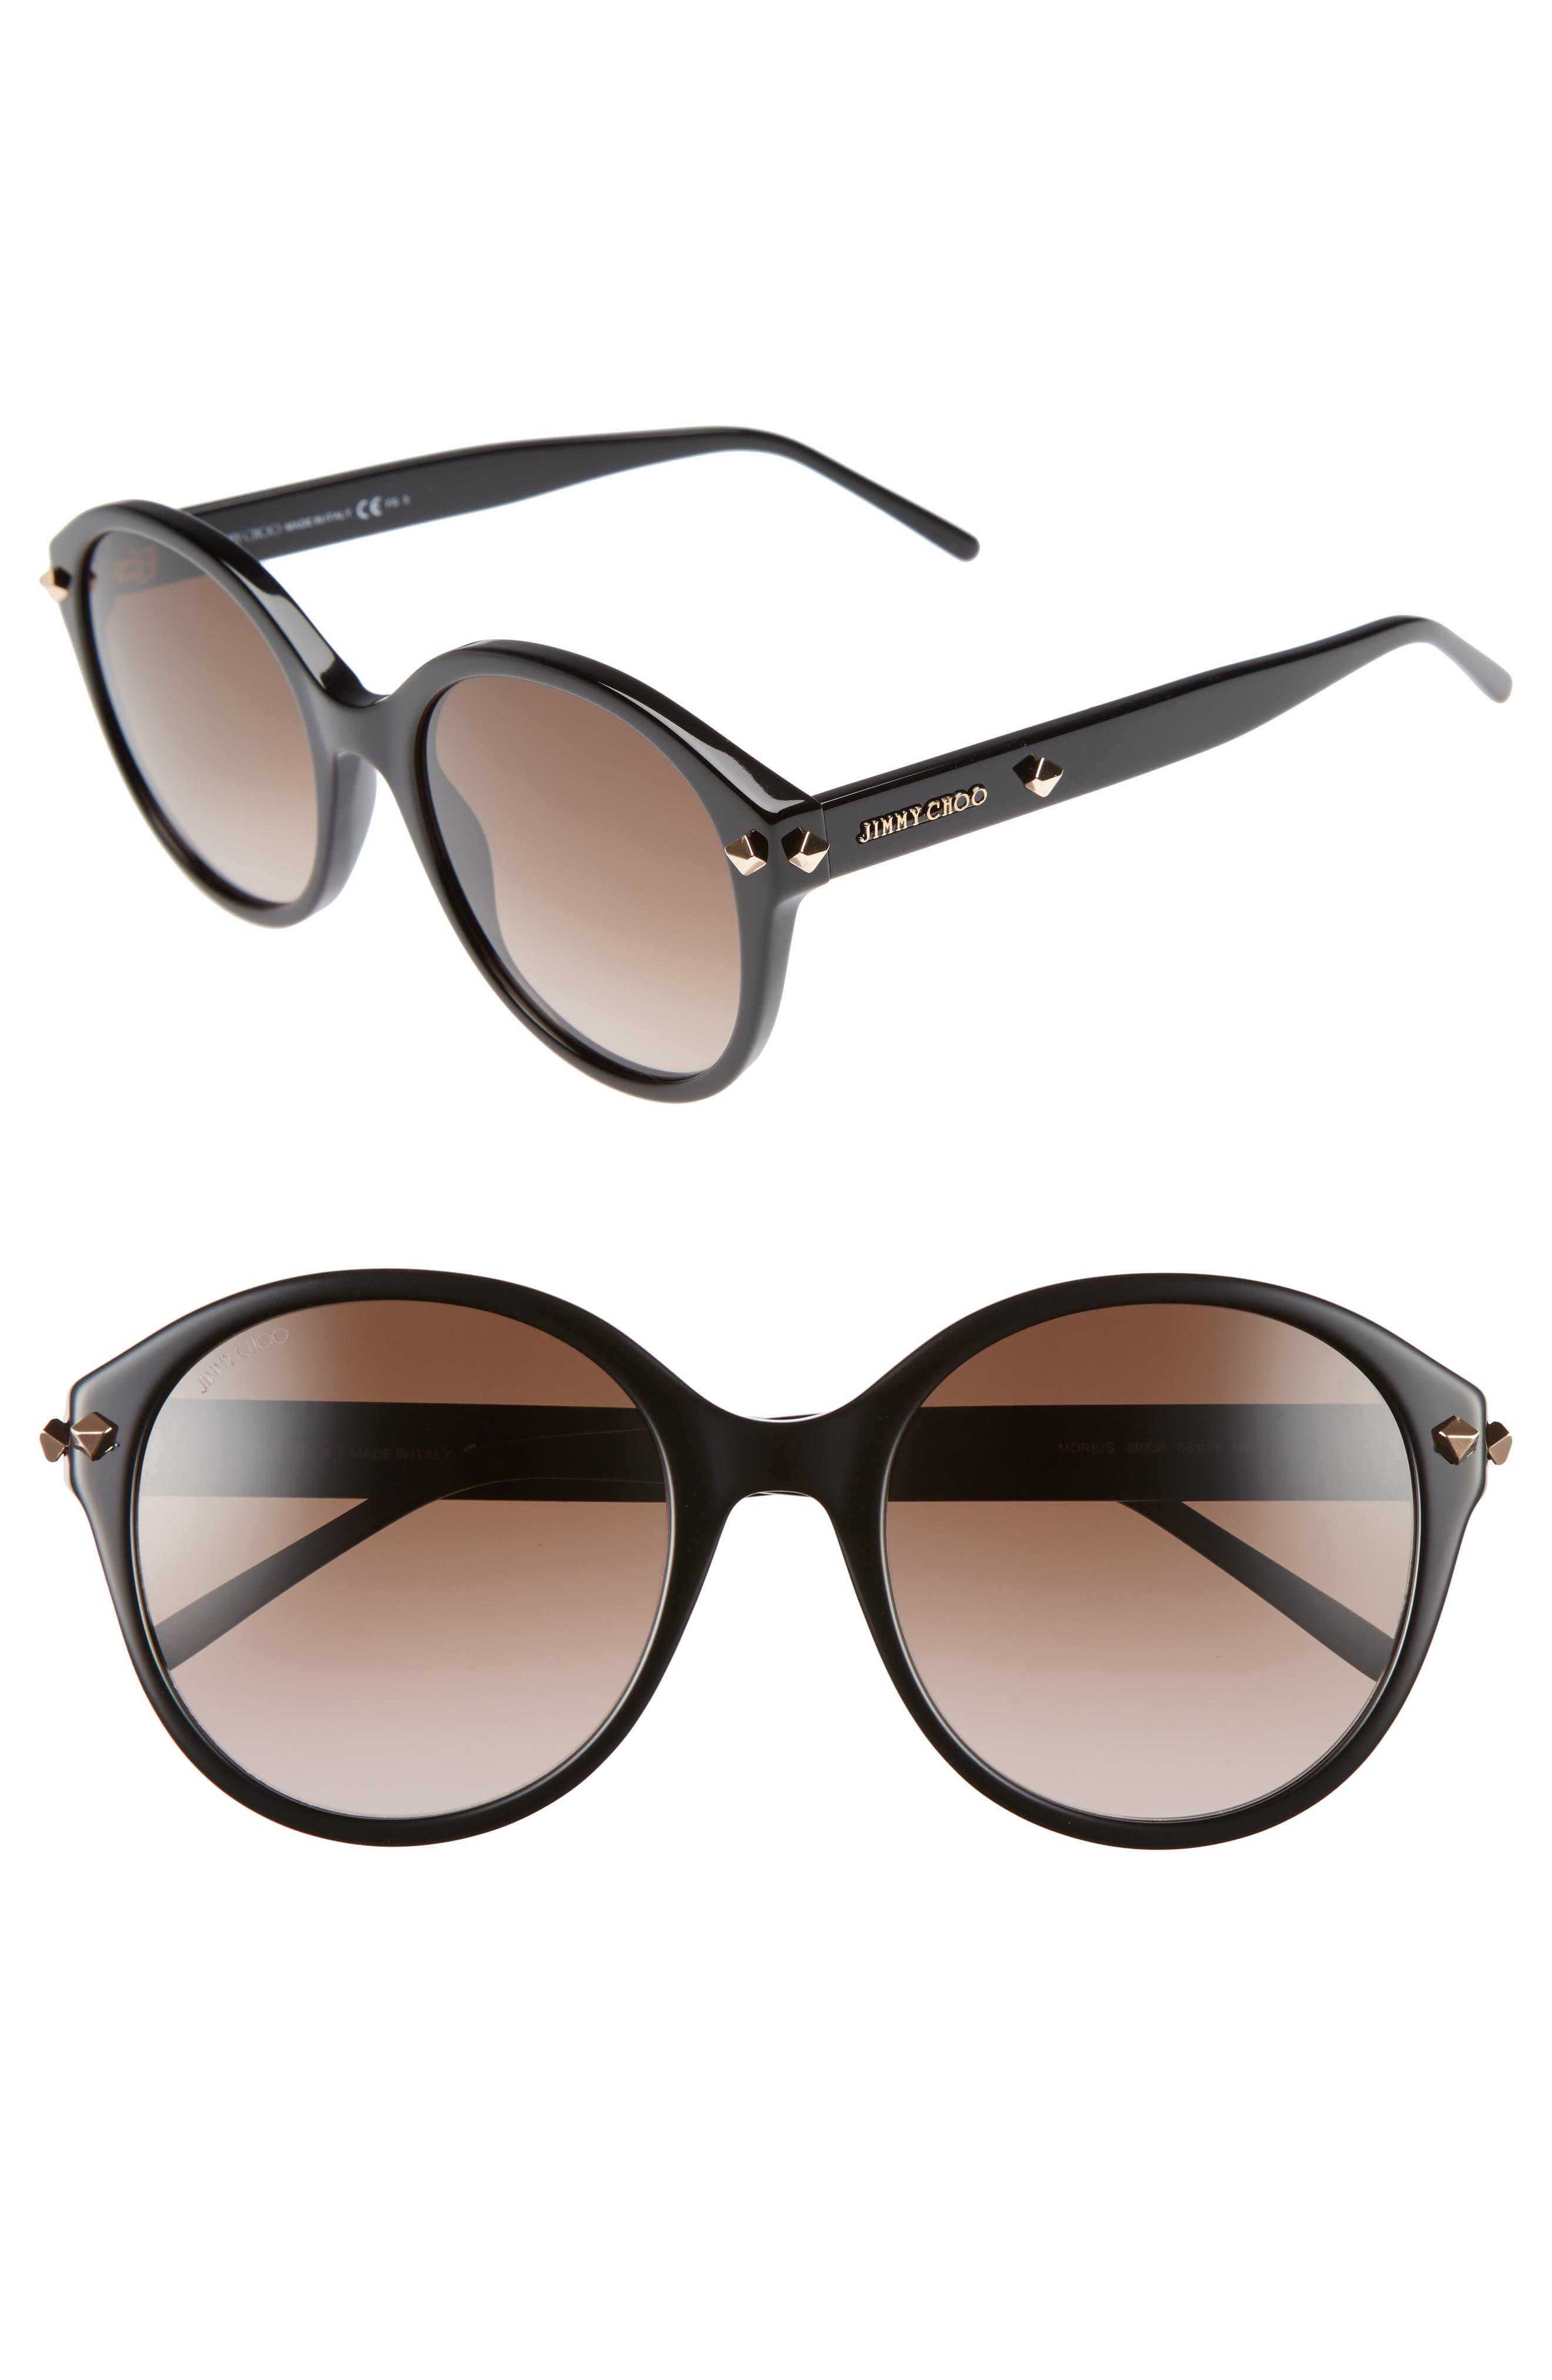 55mm Oversized Sunglasses,                             Alternate thumbnail 2, color,                             001